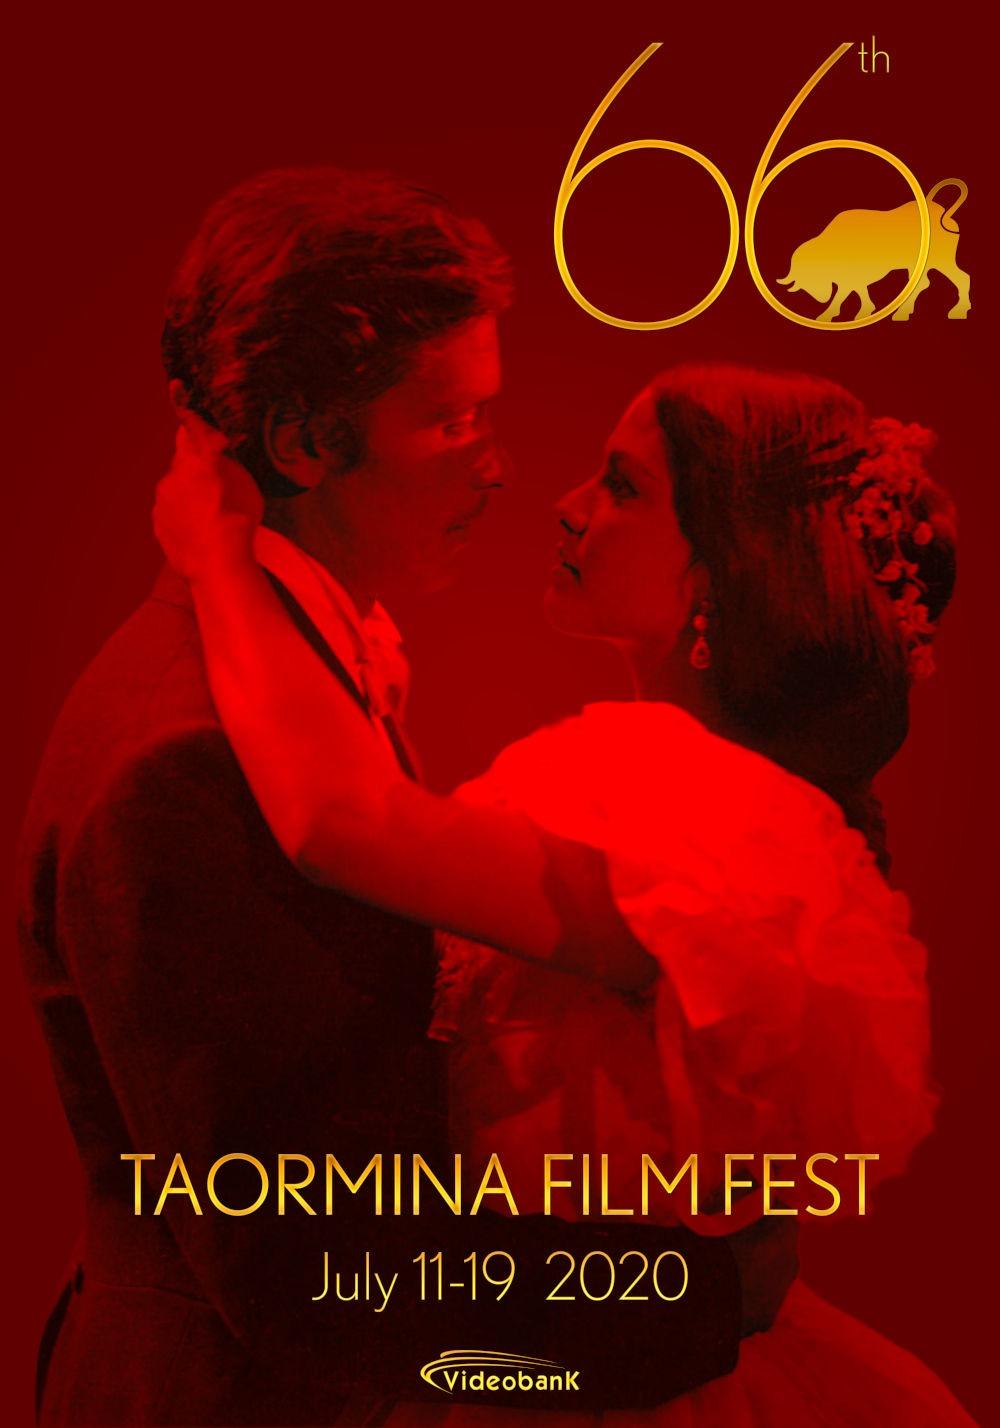 taormina-film-fest-2020-1593764847.jpg